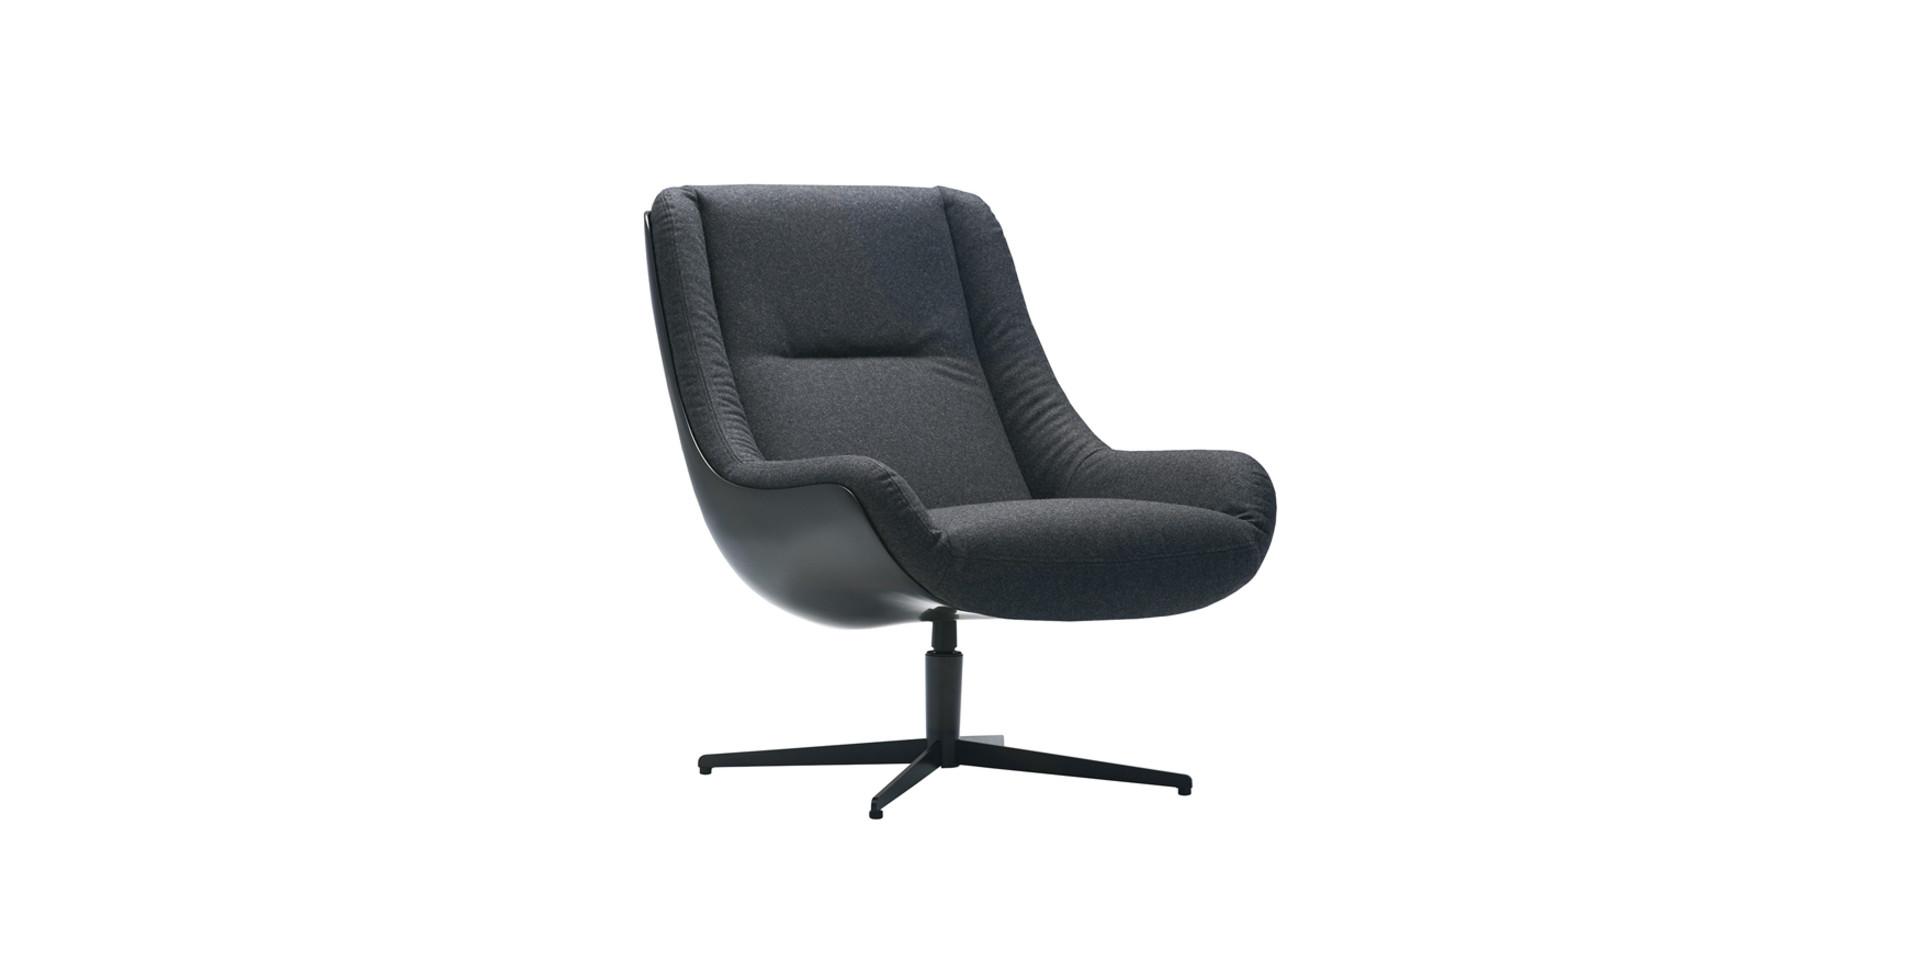 LOVEBIRD_armchair_swivel_black_panno1002_charcoal_2